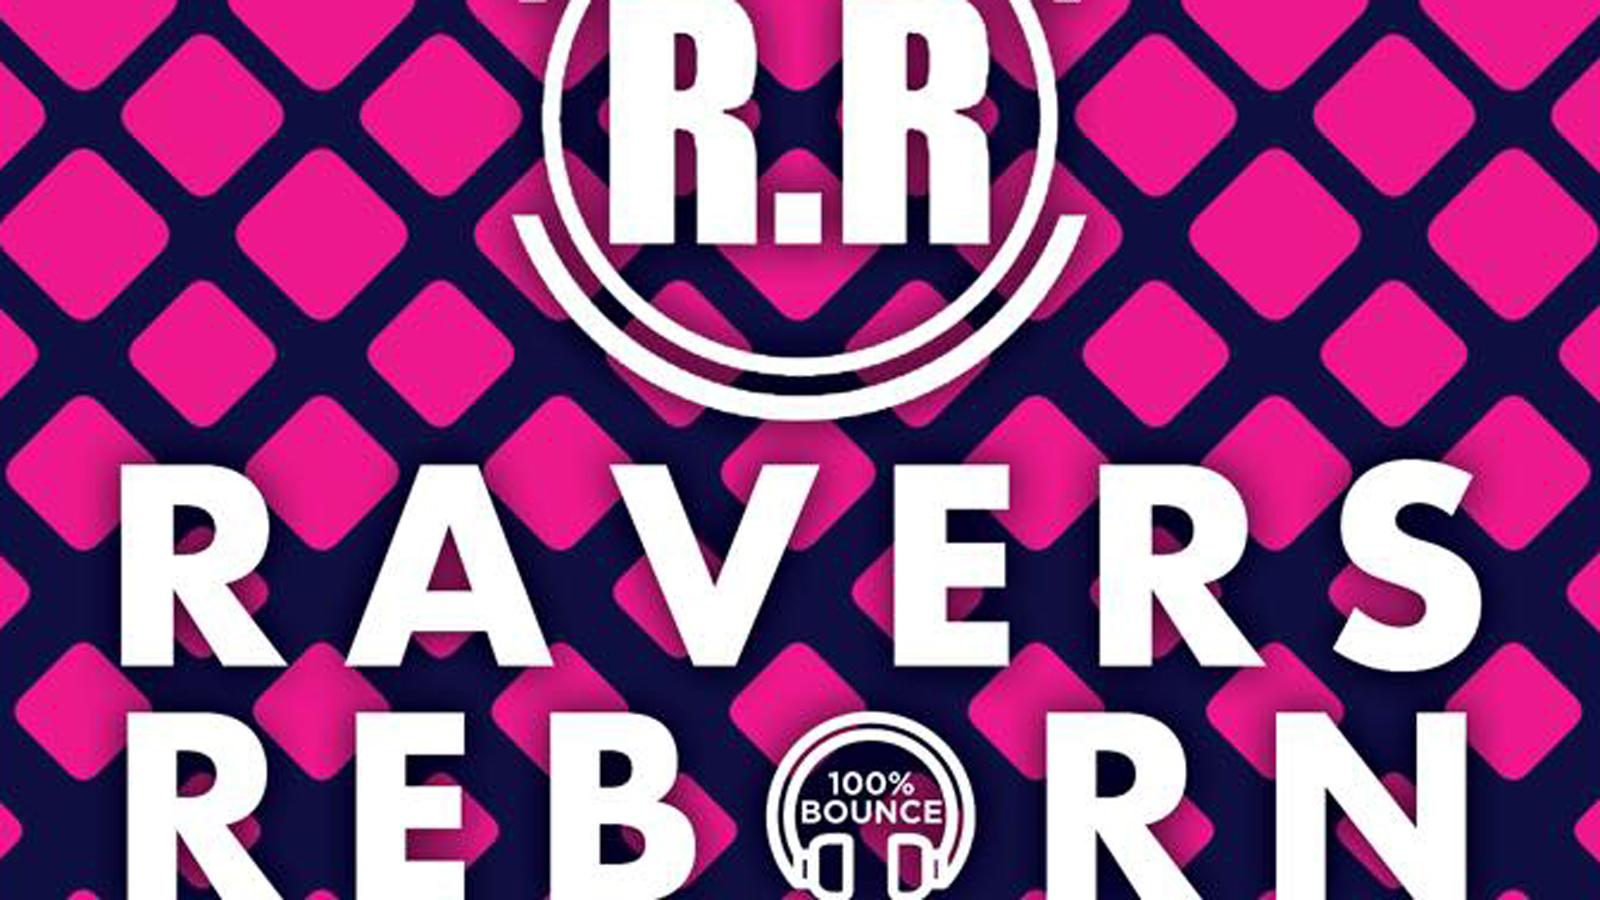 Ravers Reborn